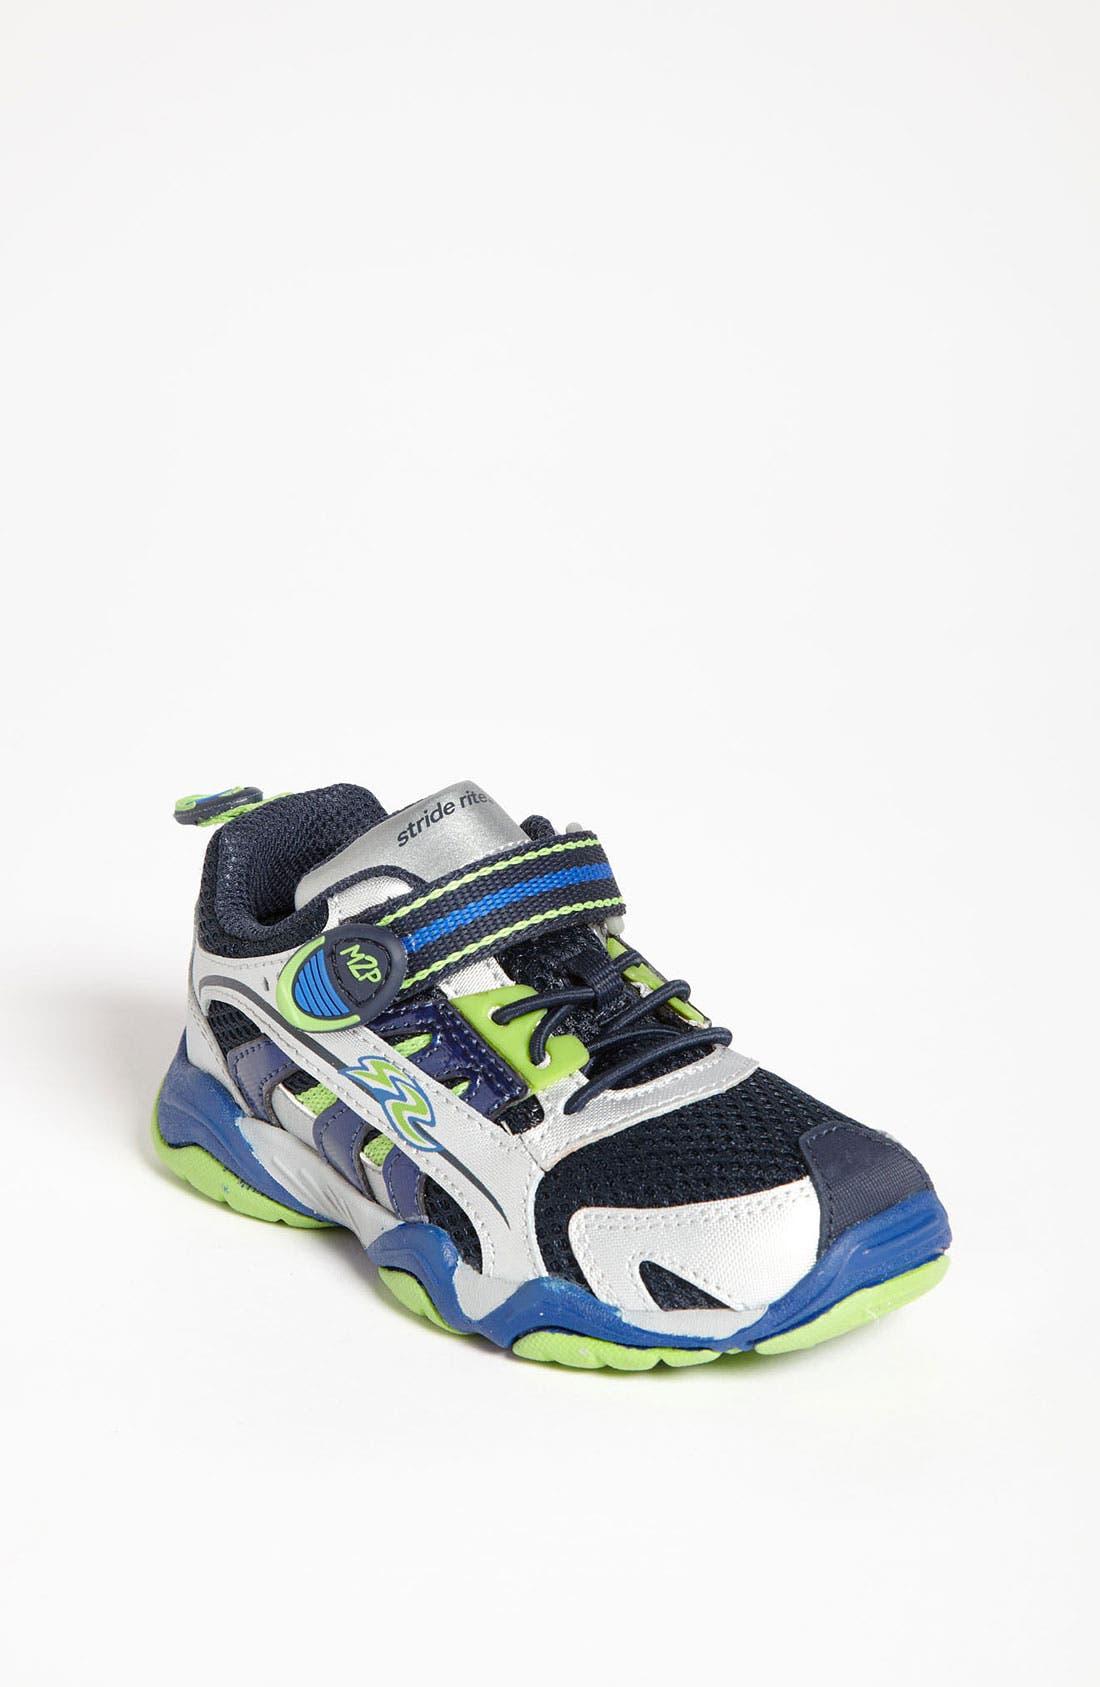 Alternate Image 1 Selected - Stride Rite 'Thorpe' Sneaker (Toddler)